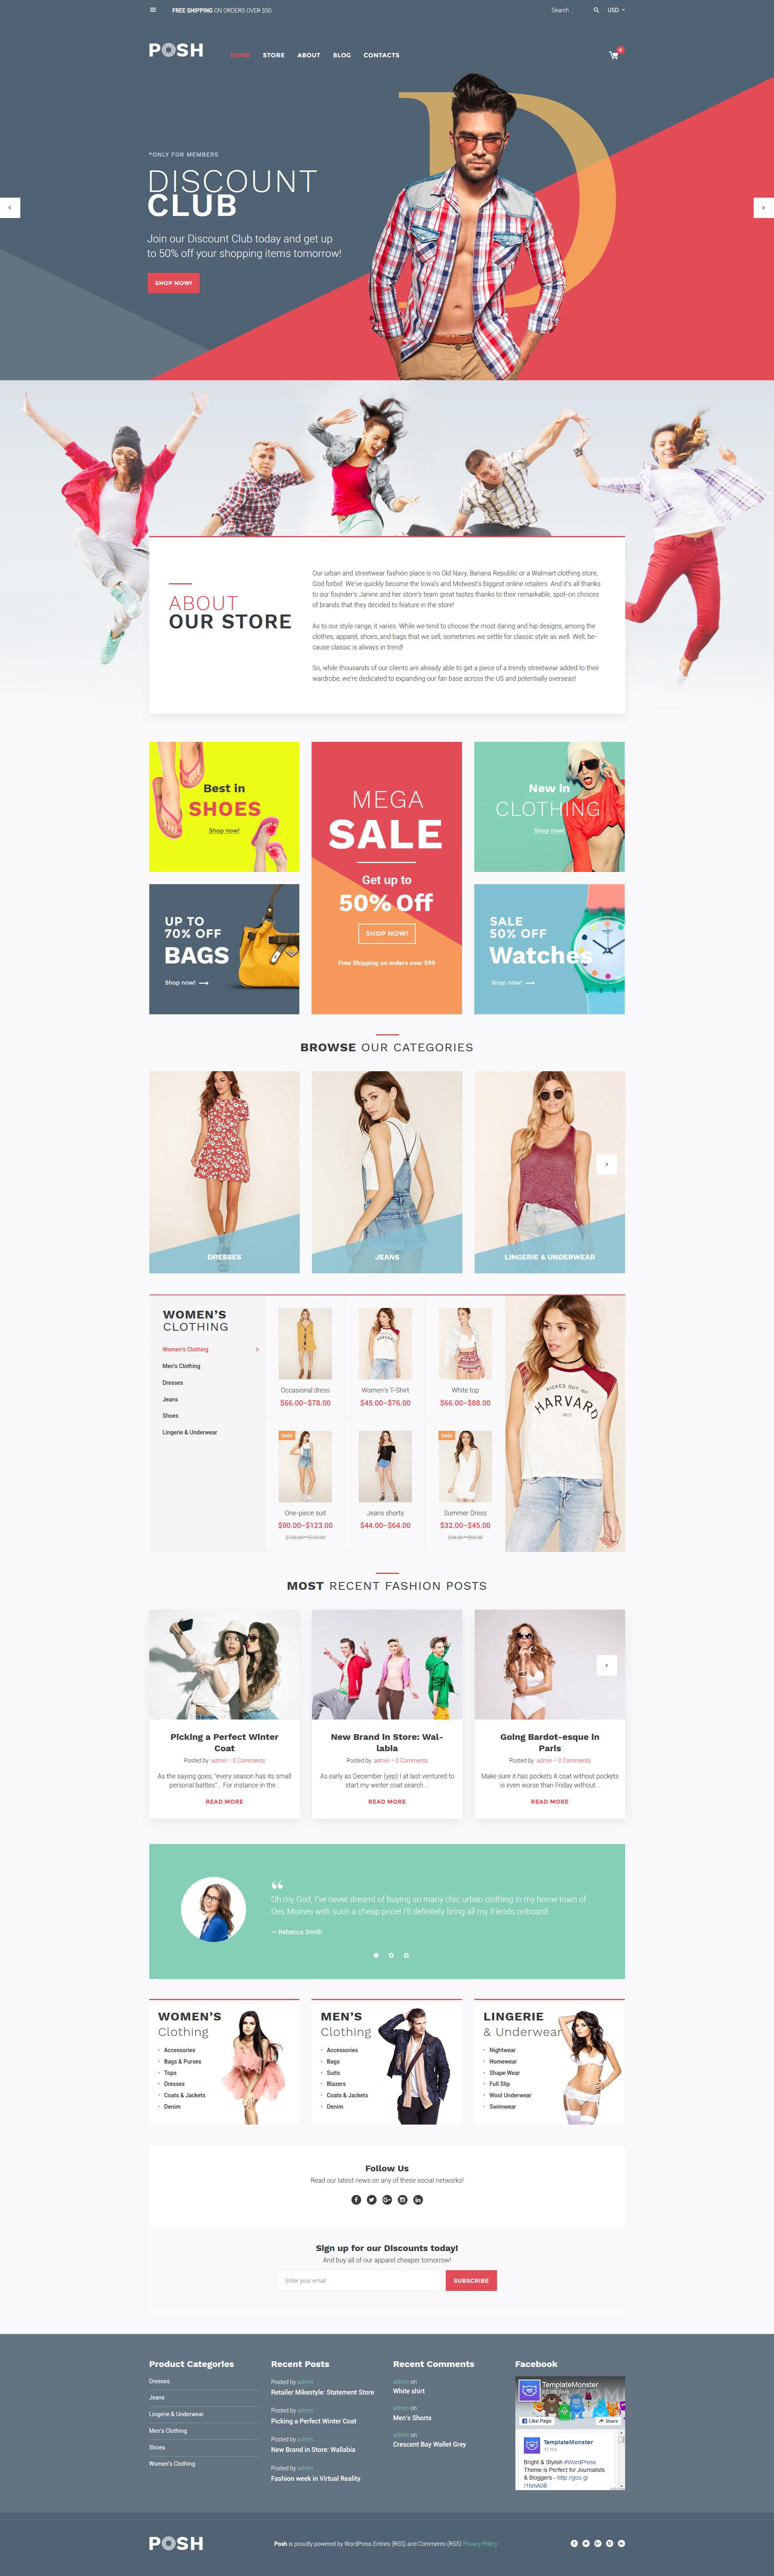 Posh - Urban Fashion WooCommerce Theme - screenshot